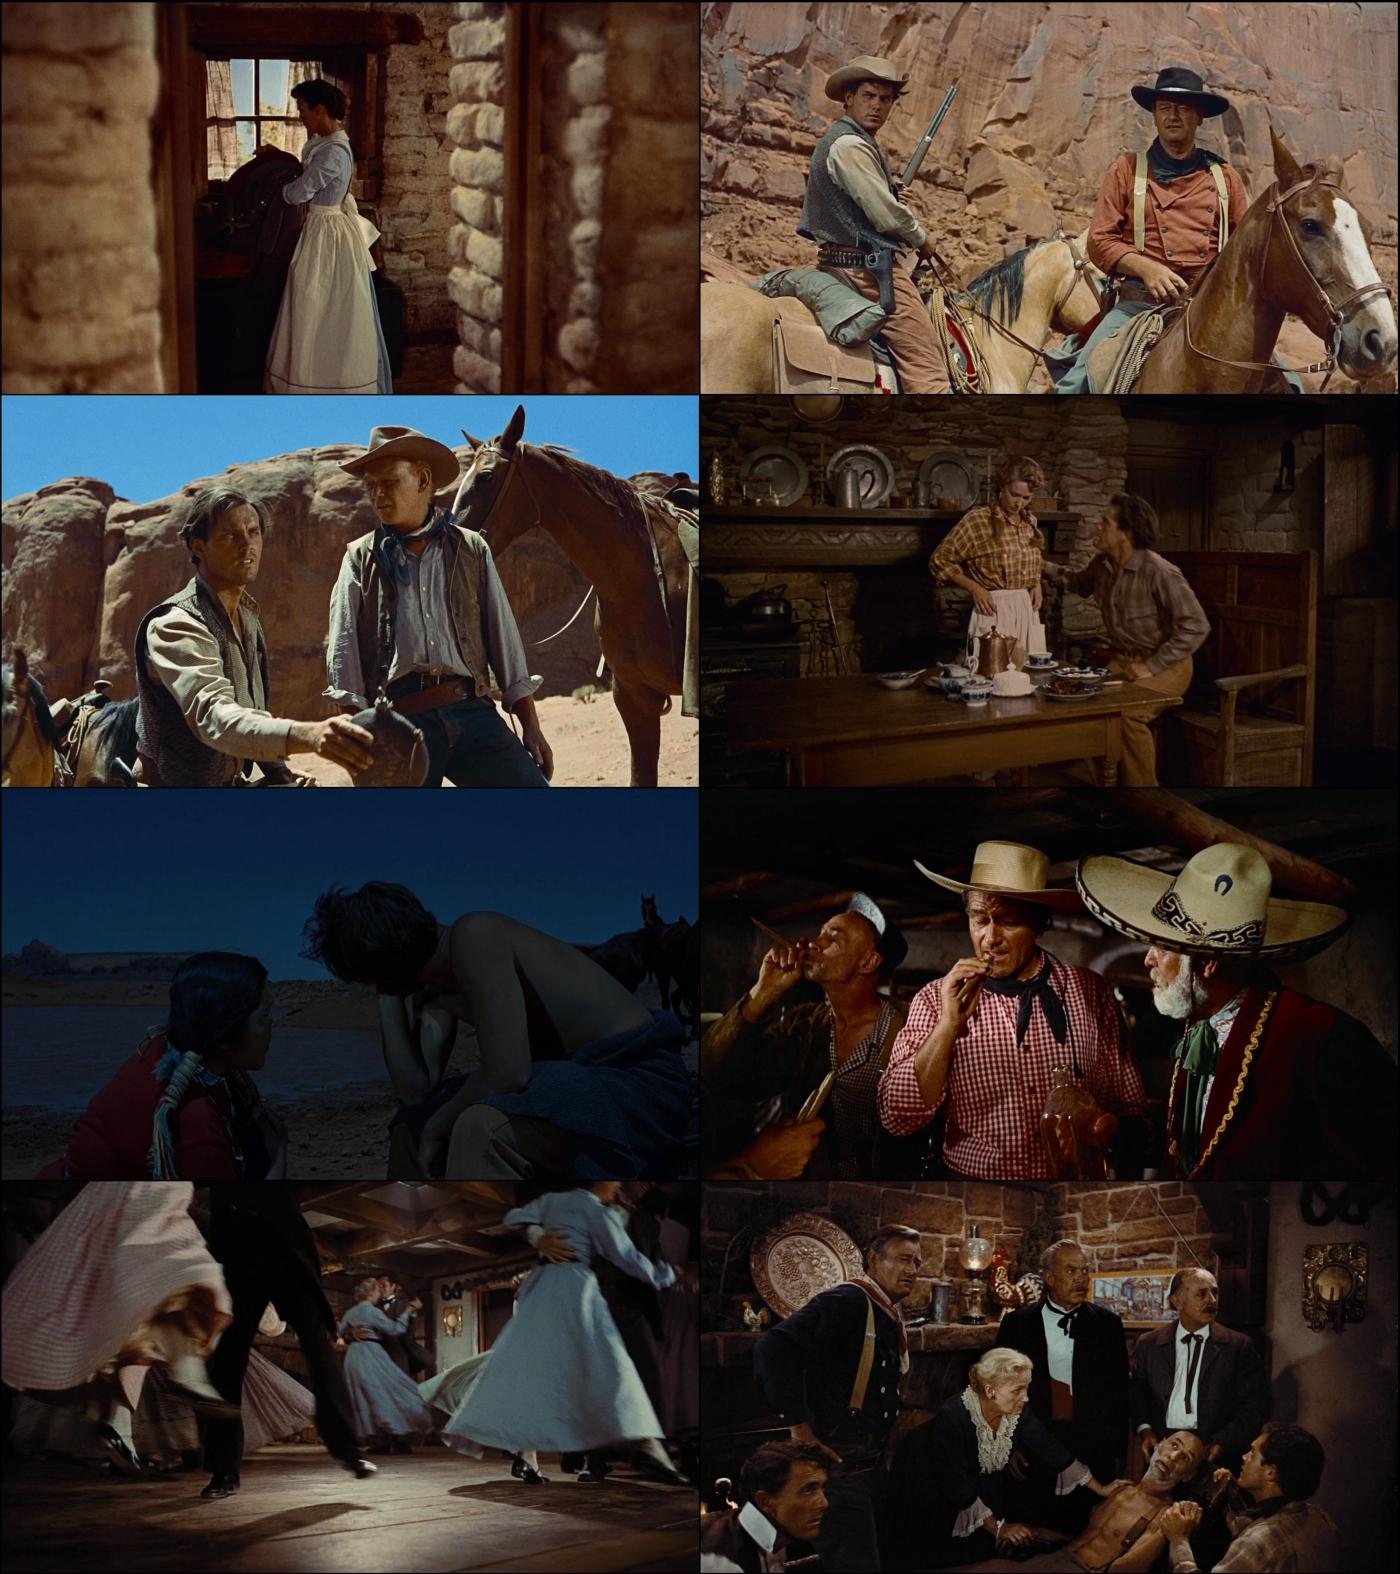 Centauros del desierto 1080p Latino